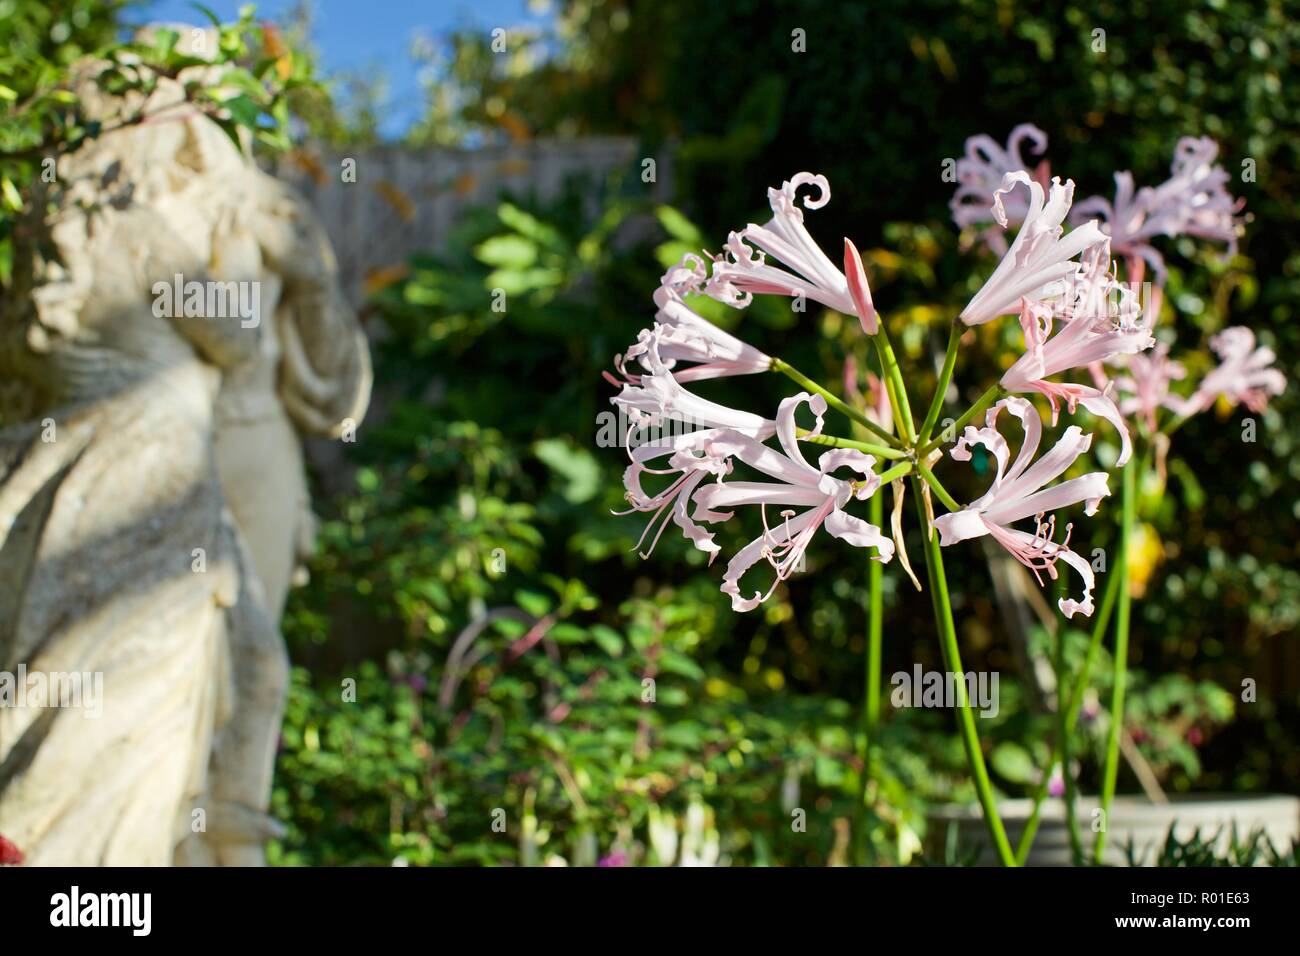 Nerine Bowdenii - Stock Image